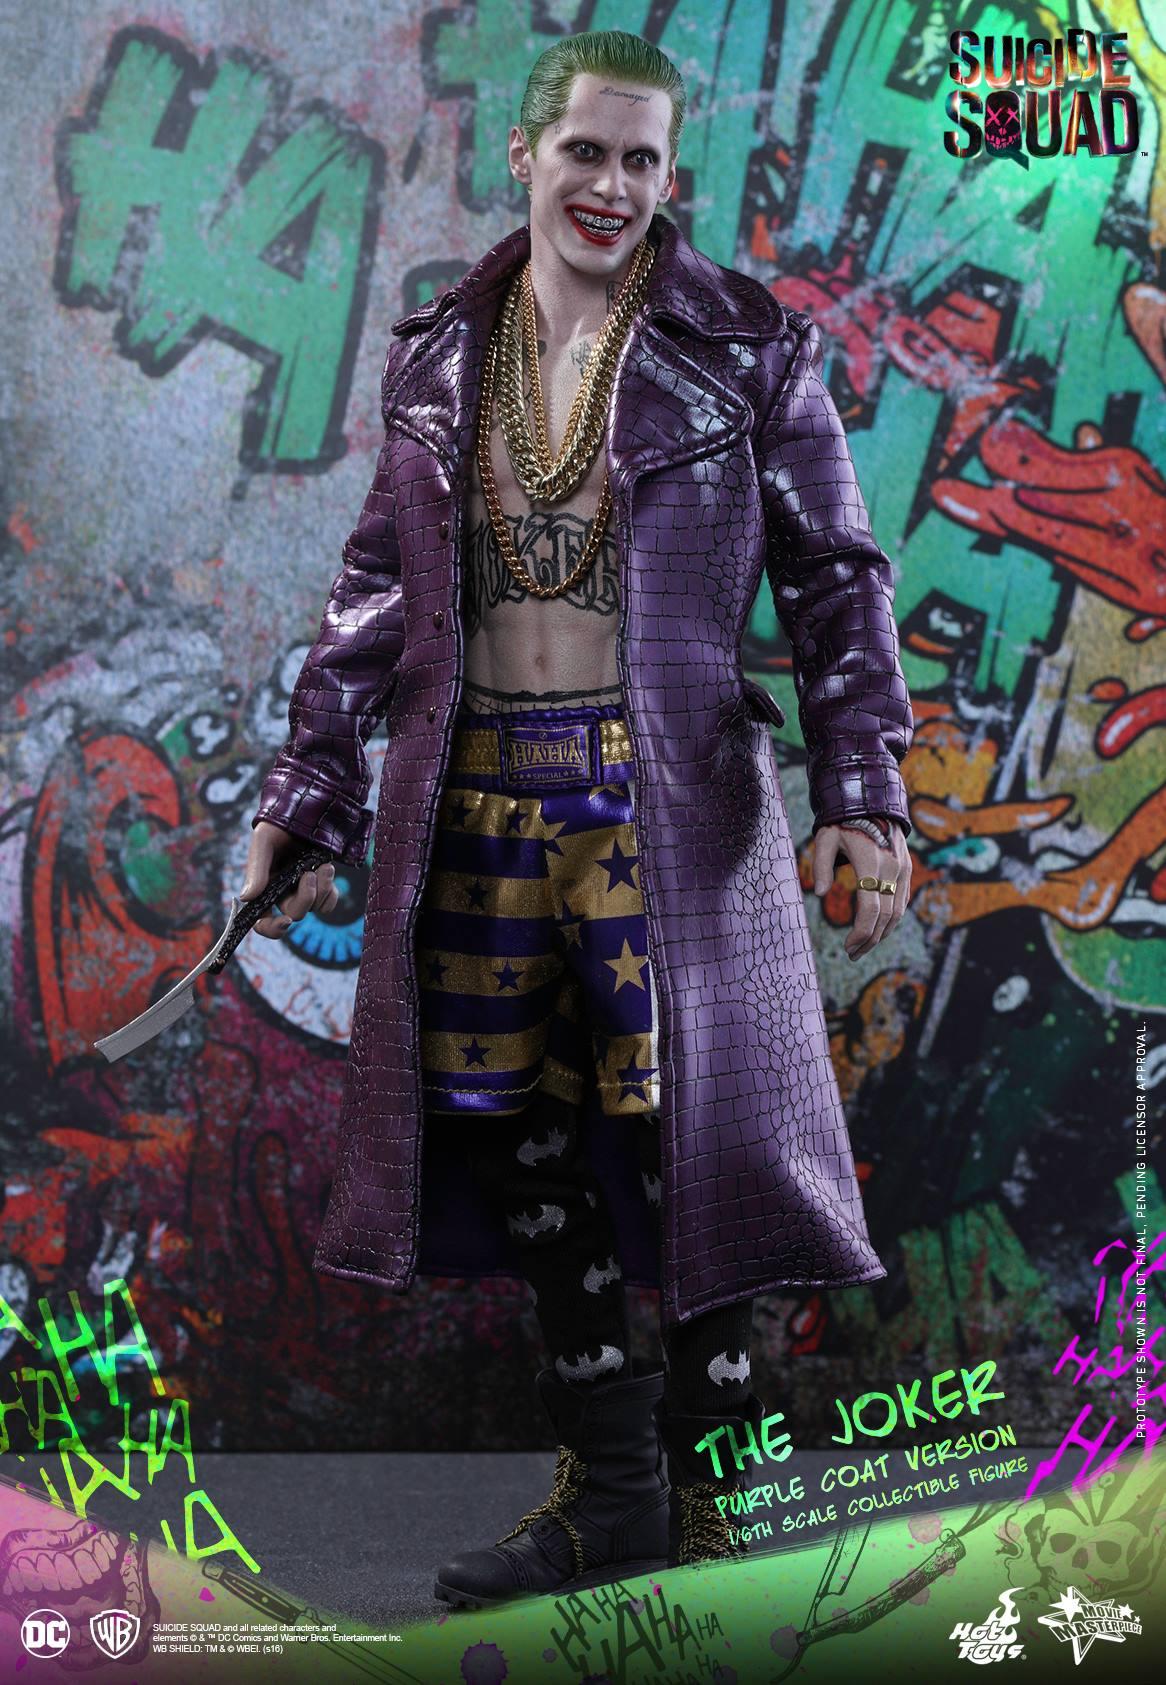 Hot-Toys-Suicide-Squad-Joker-Purple-Coat-12